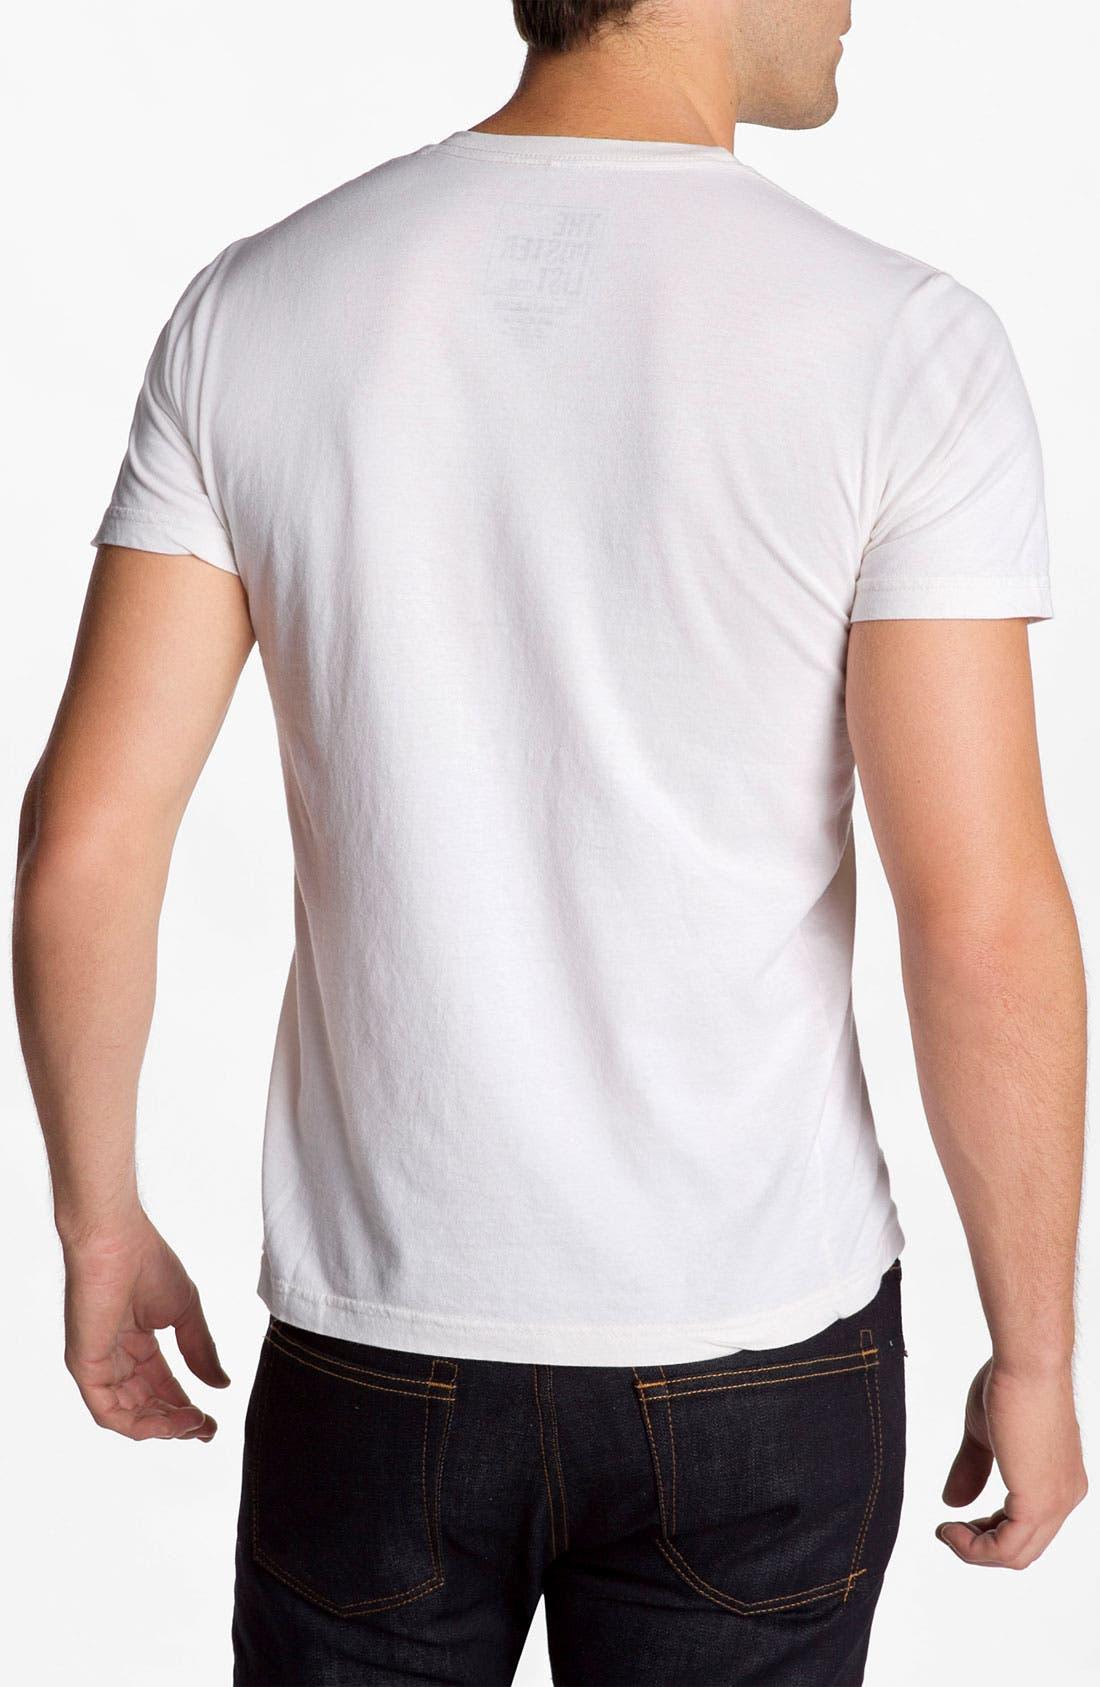 Alternate Image 2  - The Poster List 'Surf Fan' T-Shirt